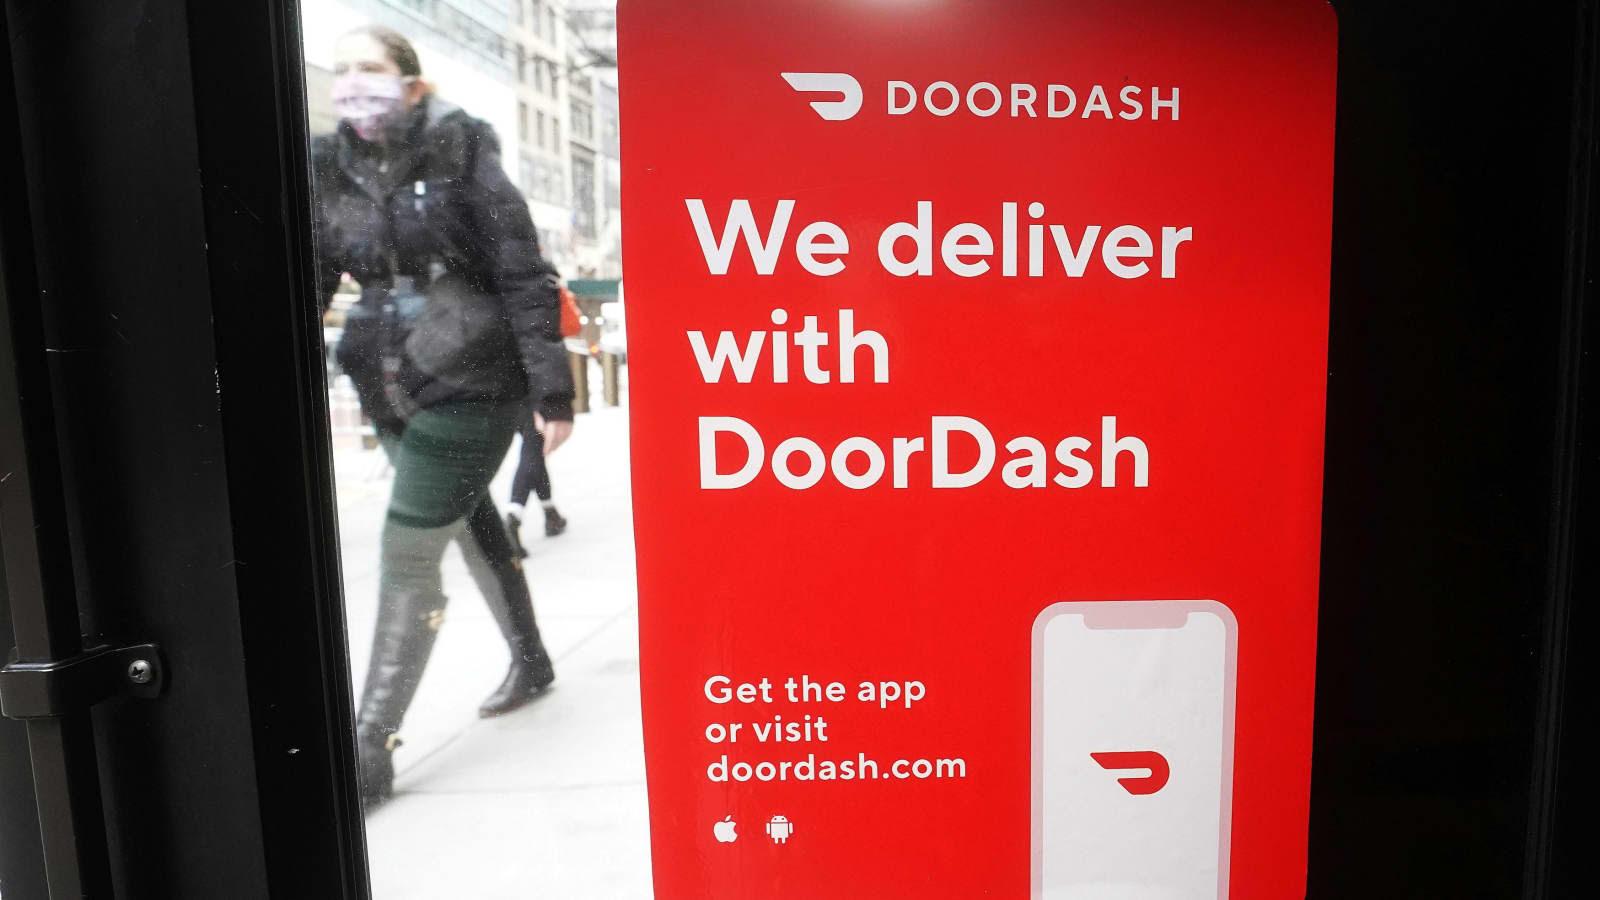 DoorDash sues New York City over new data sharing law